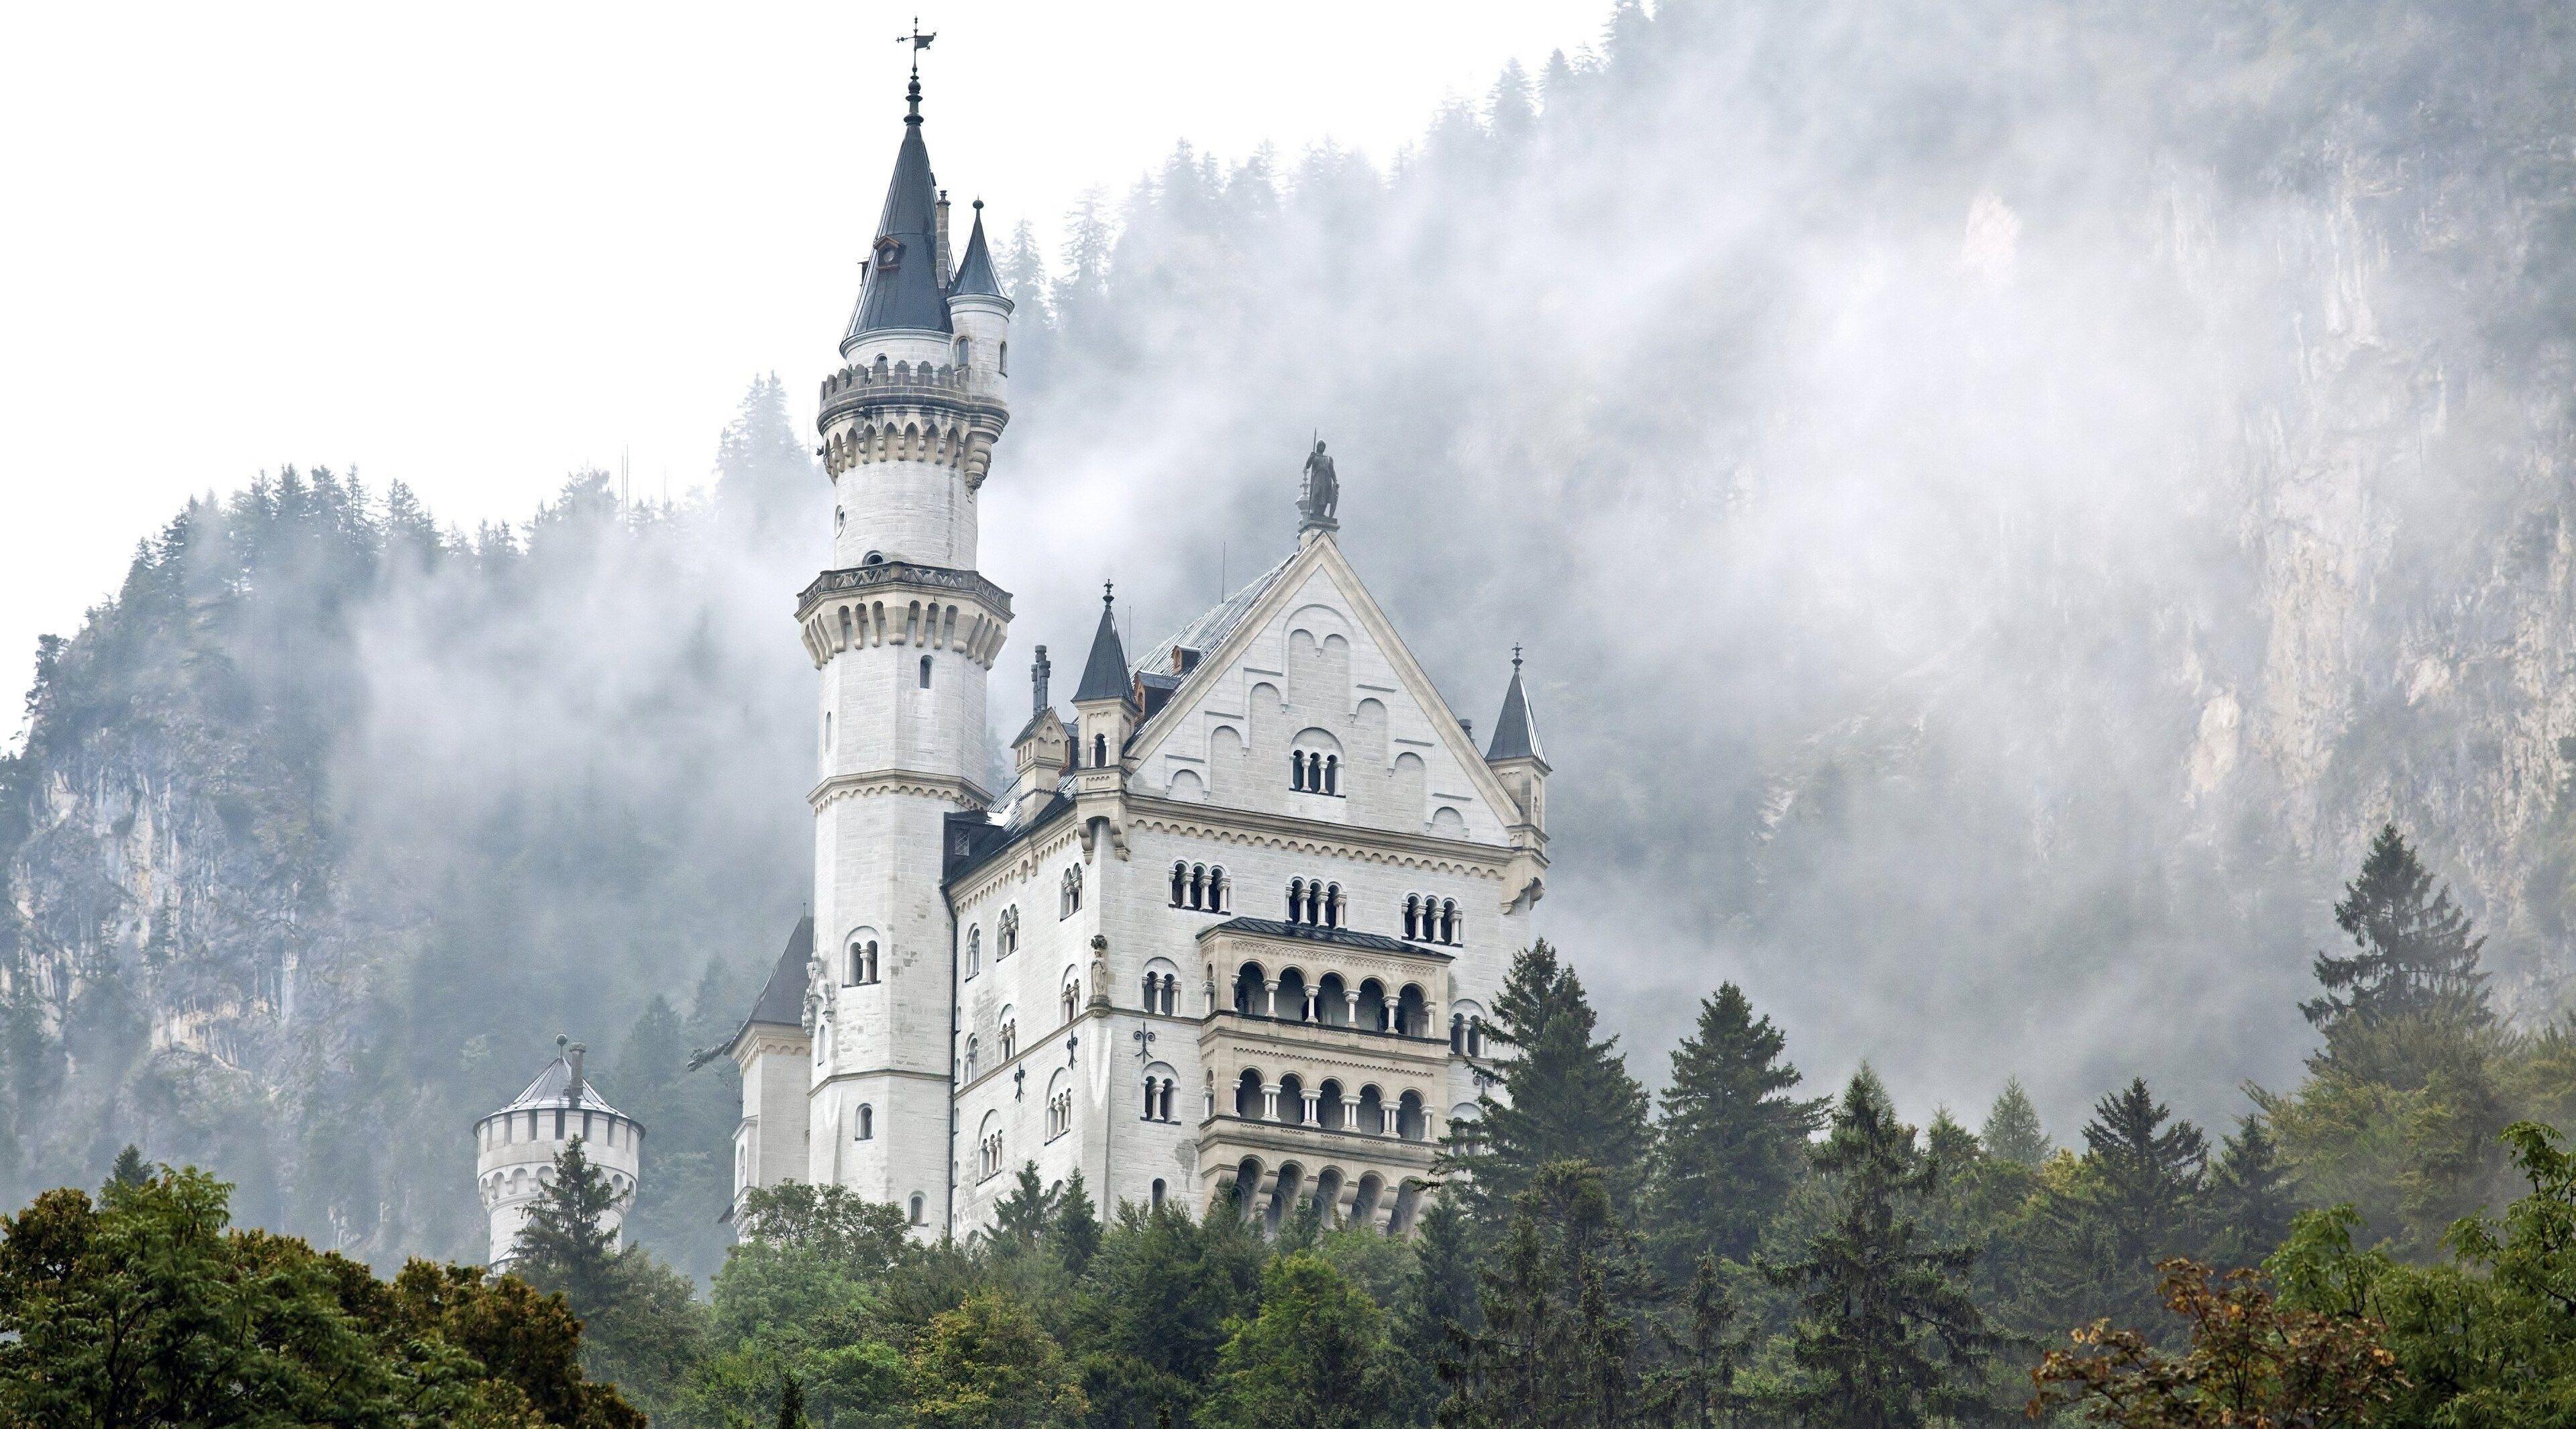 3840x2130 Neuschwanstein Castle 4k New Pic Neuschwanstein Castle Castle Germany Castles